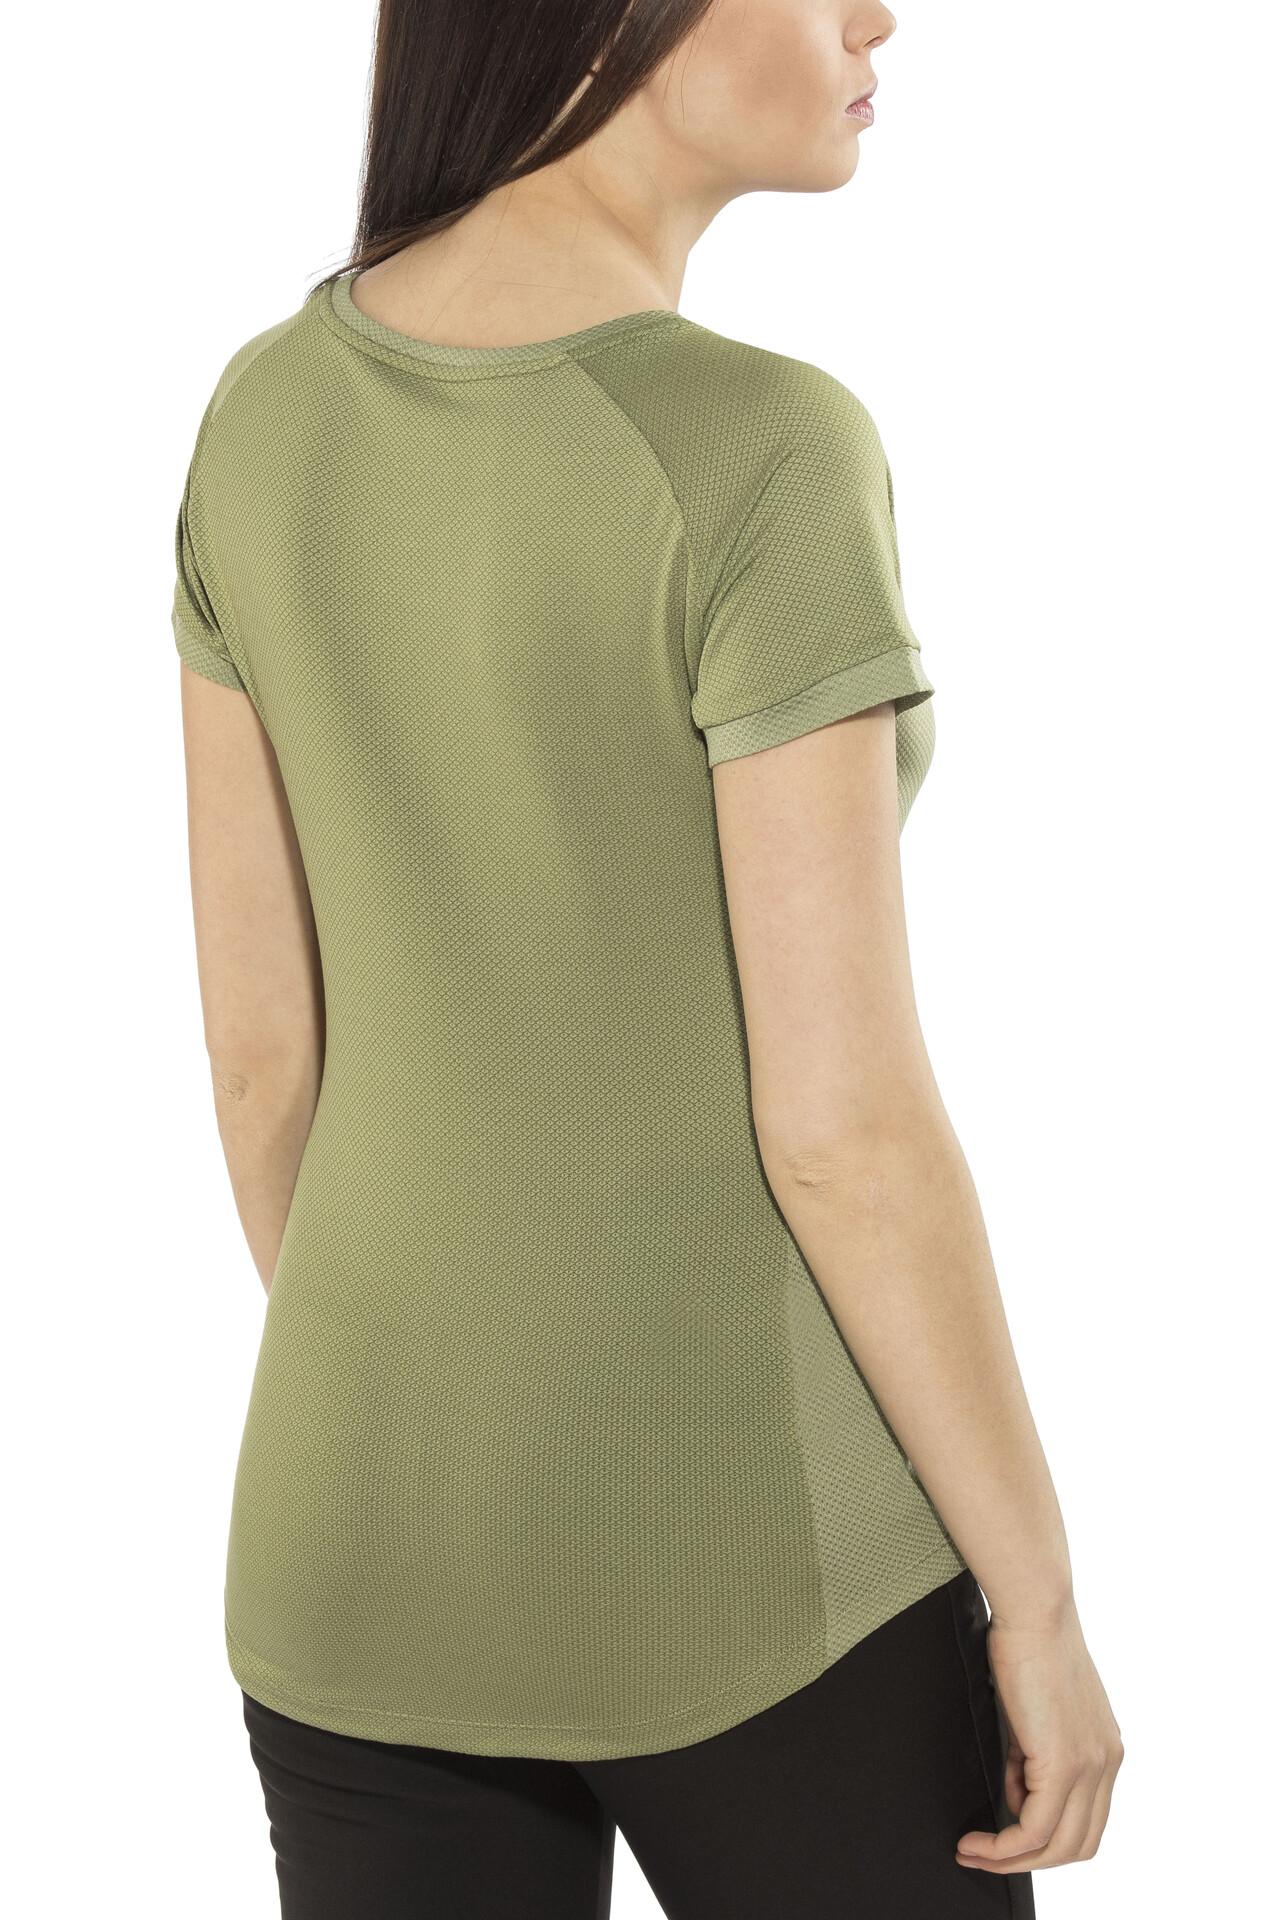 Salewa Pedroc Delta Dry SS Tee T Shirt Damen | Review